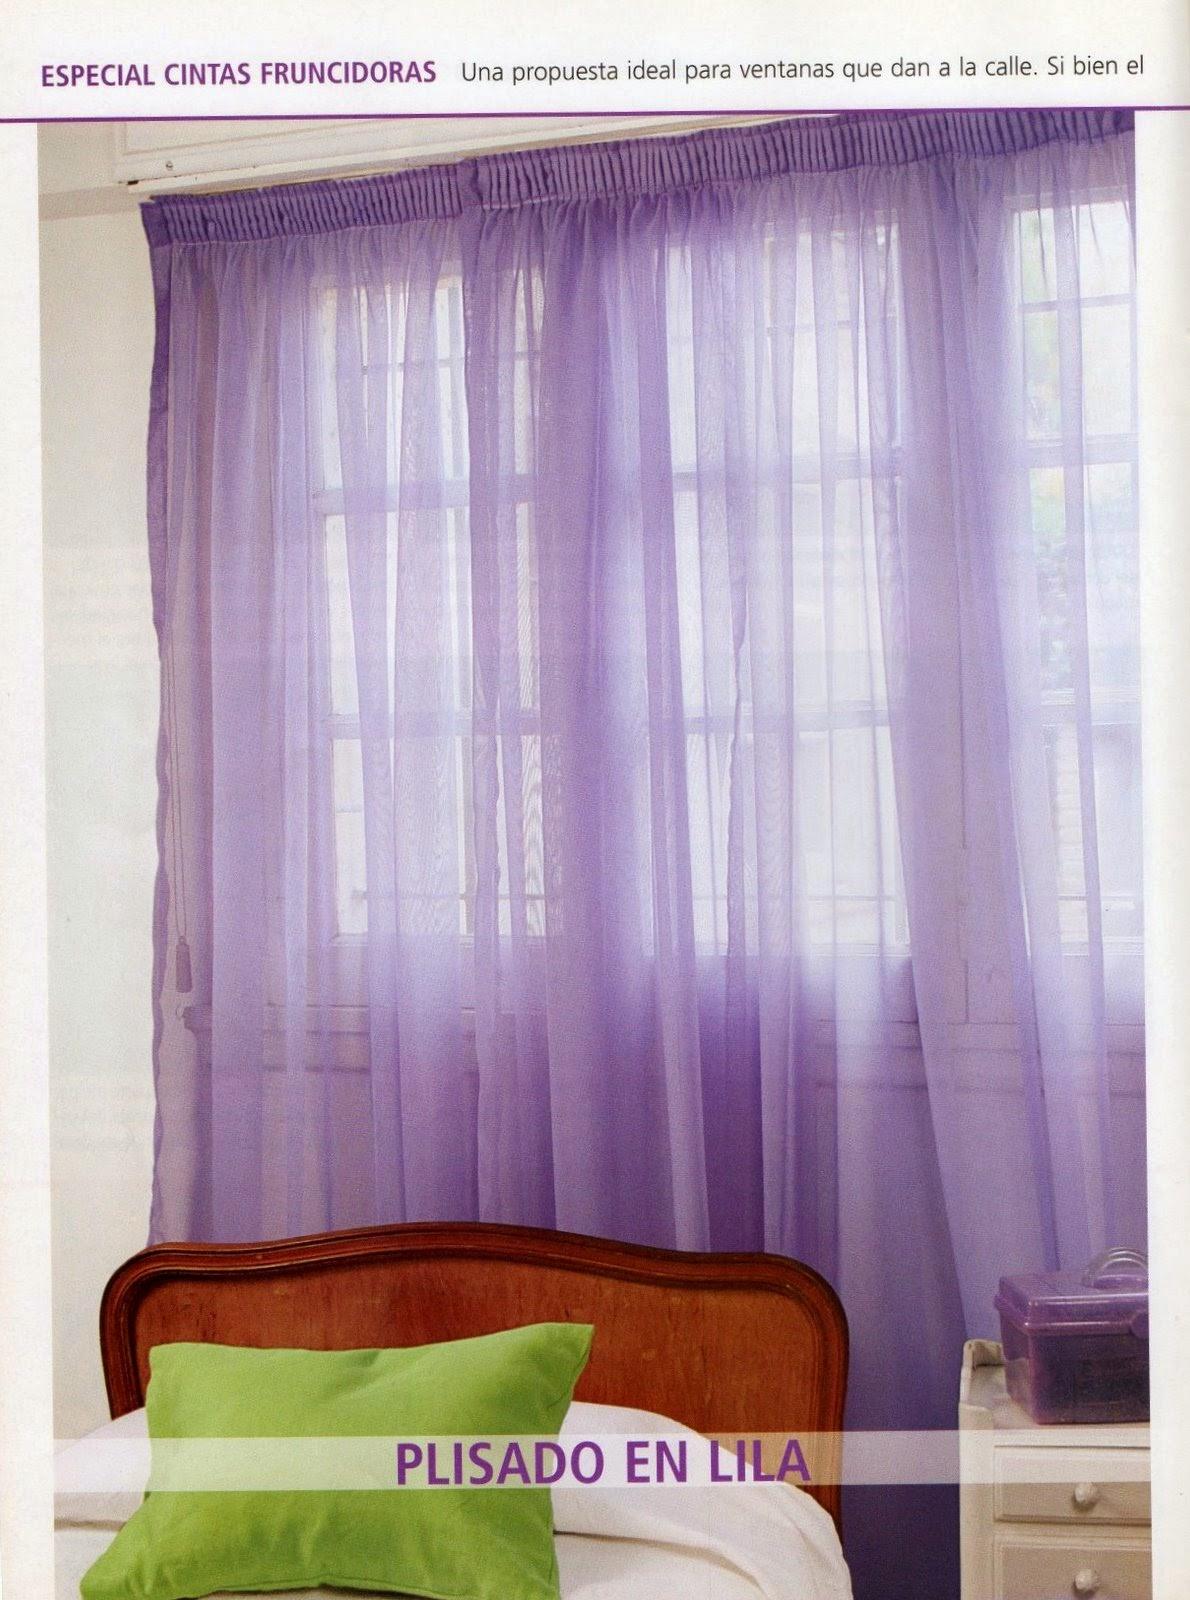 Como hacer cortinas paso a paso revistas de manualidades - Hacer cortinas infantiles ...